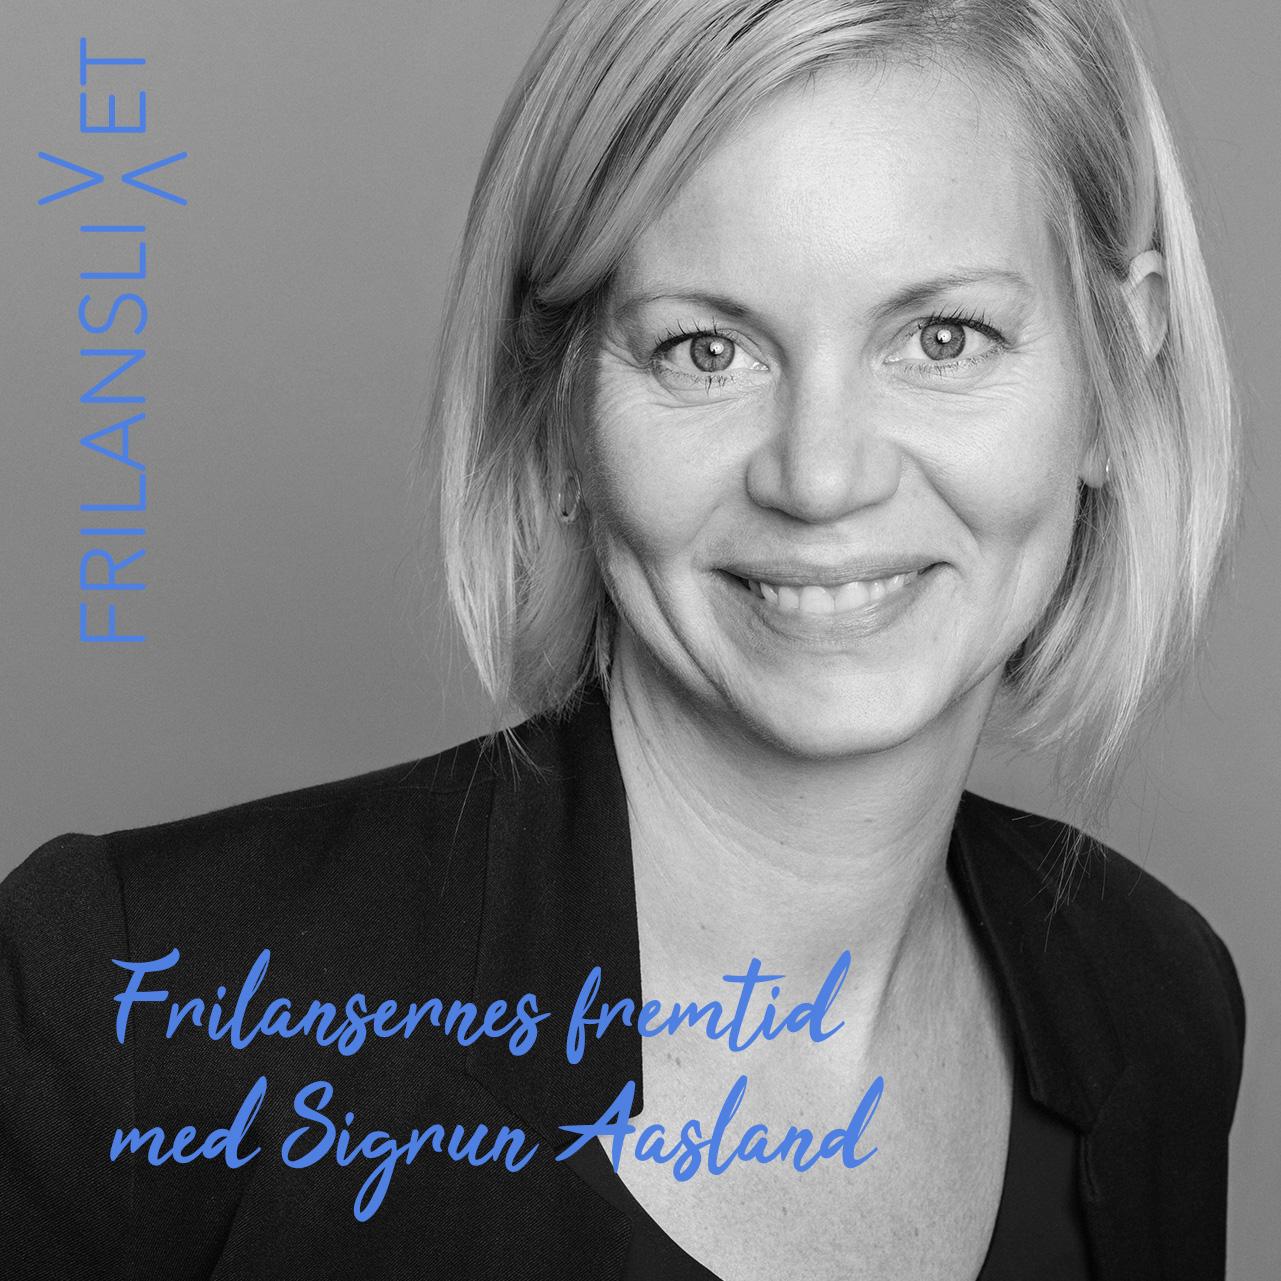 Foto: Kaja Bruskeland & Elen Sonja Klouman